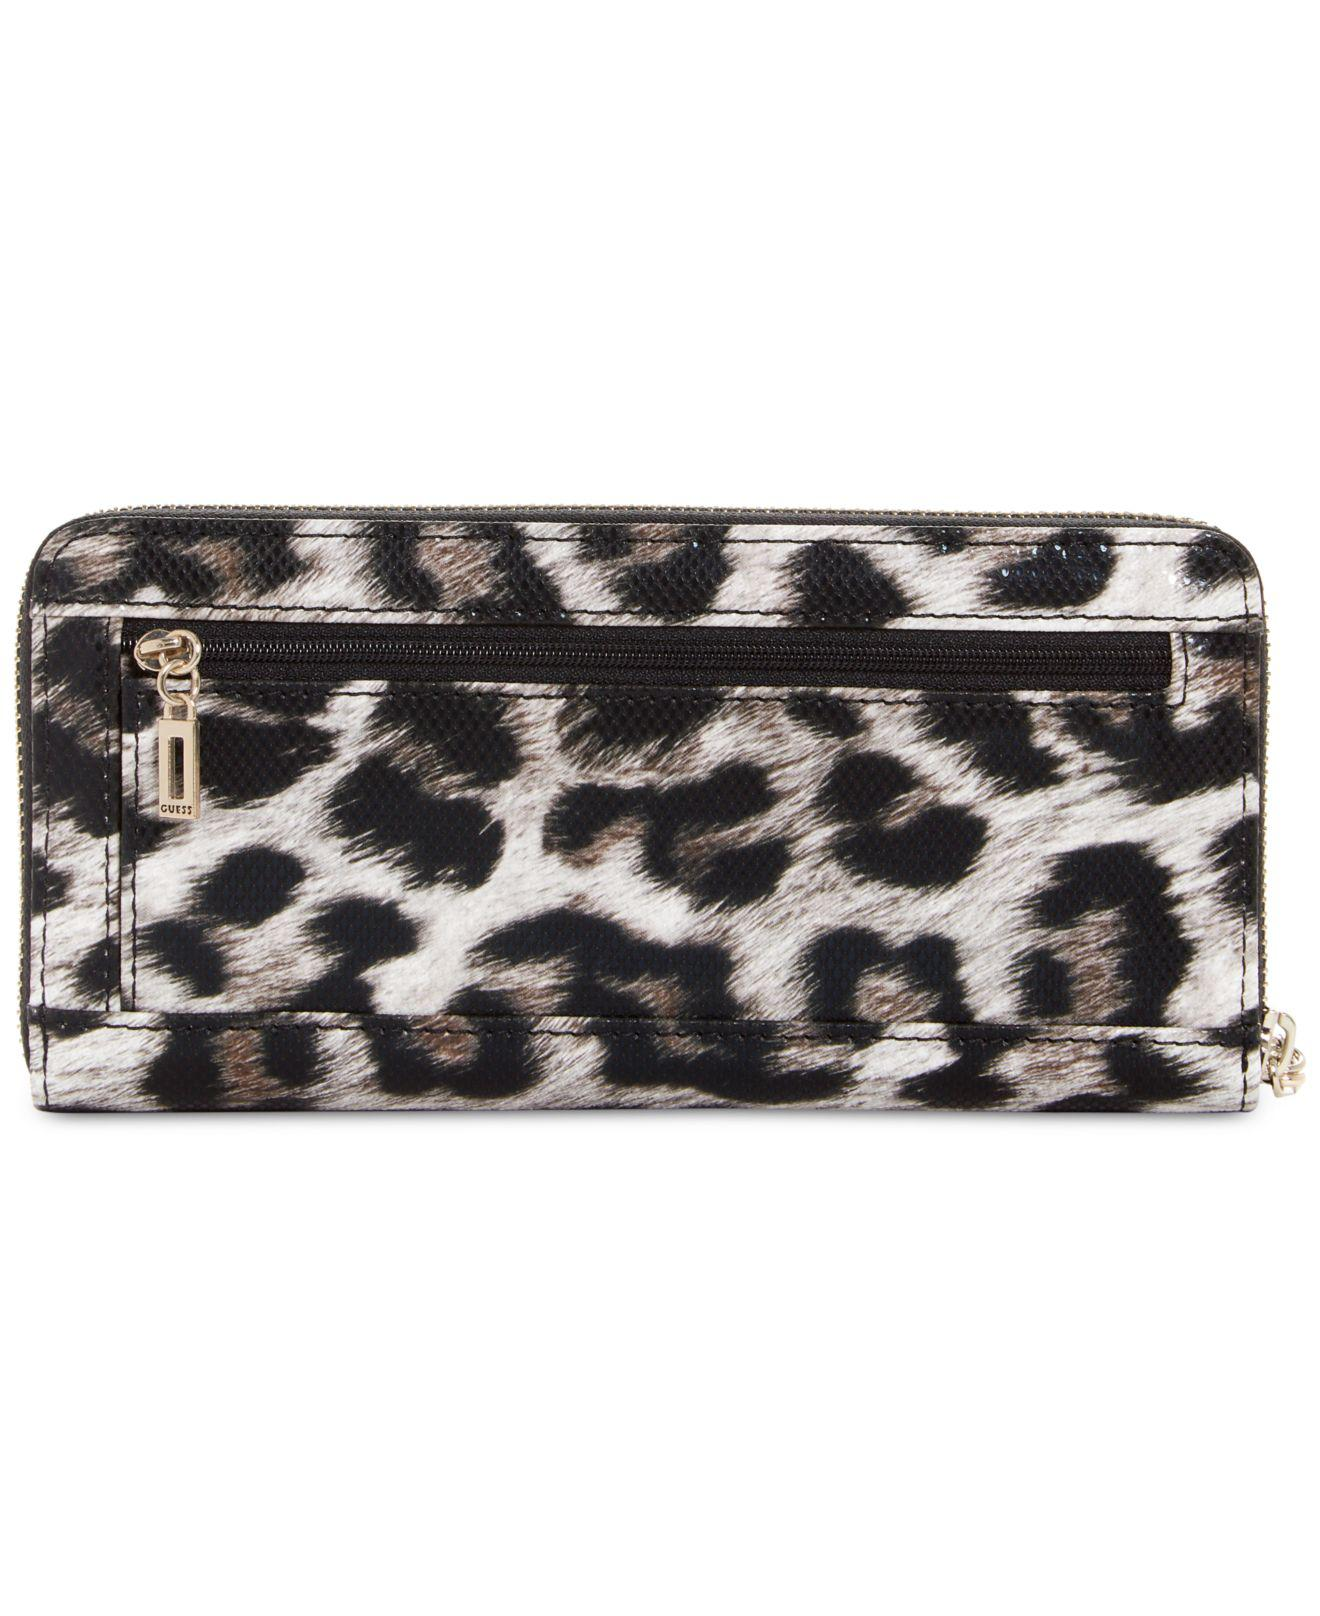 9af647fc0b49 ... mk logo checkbook wallet wallets; guess britta leopard large zip around  wallet lyst ...